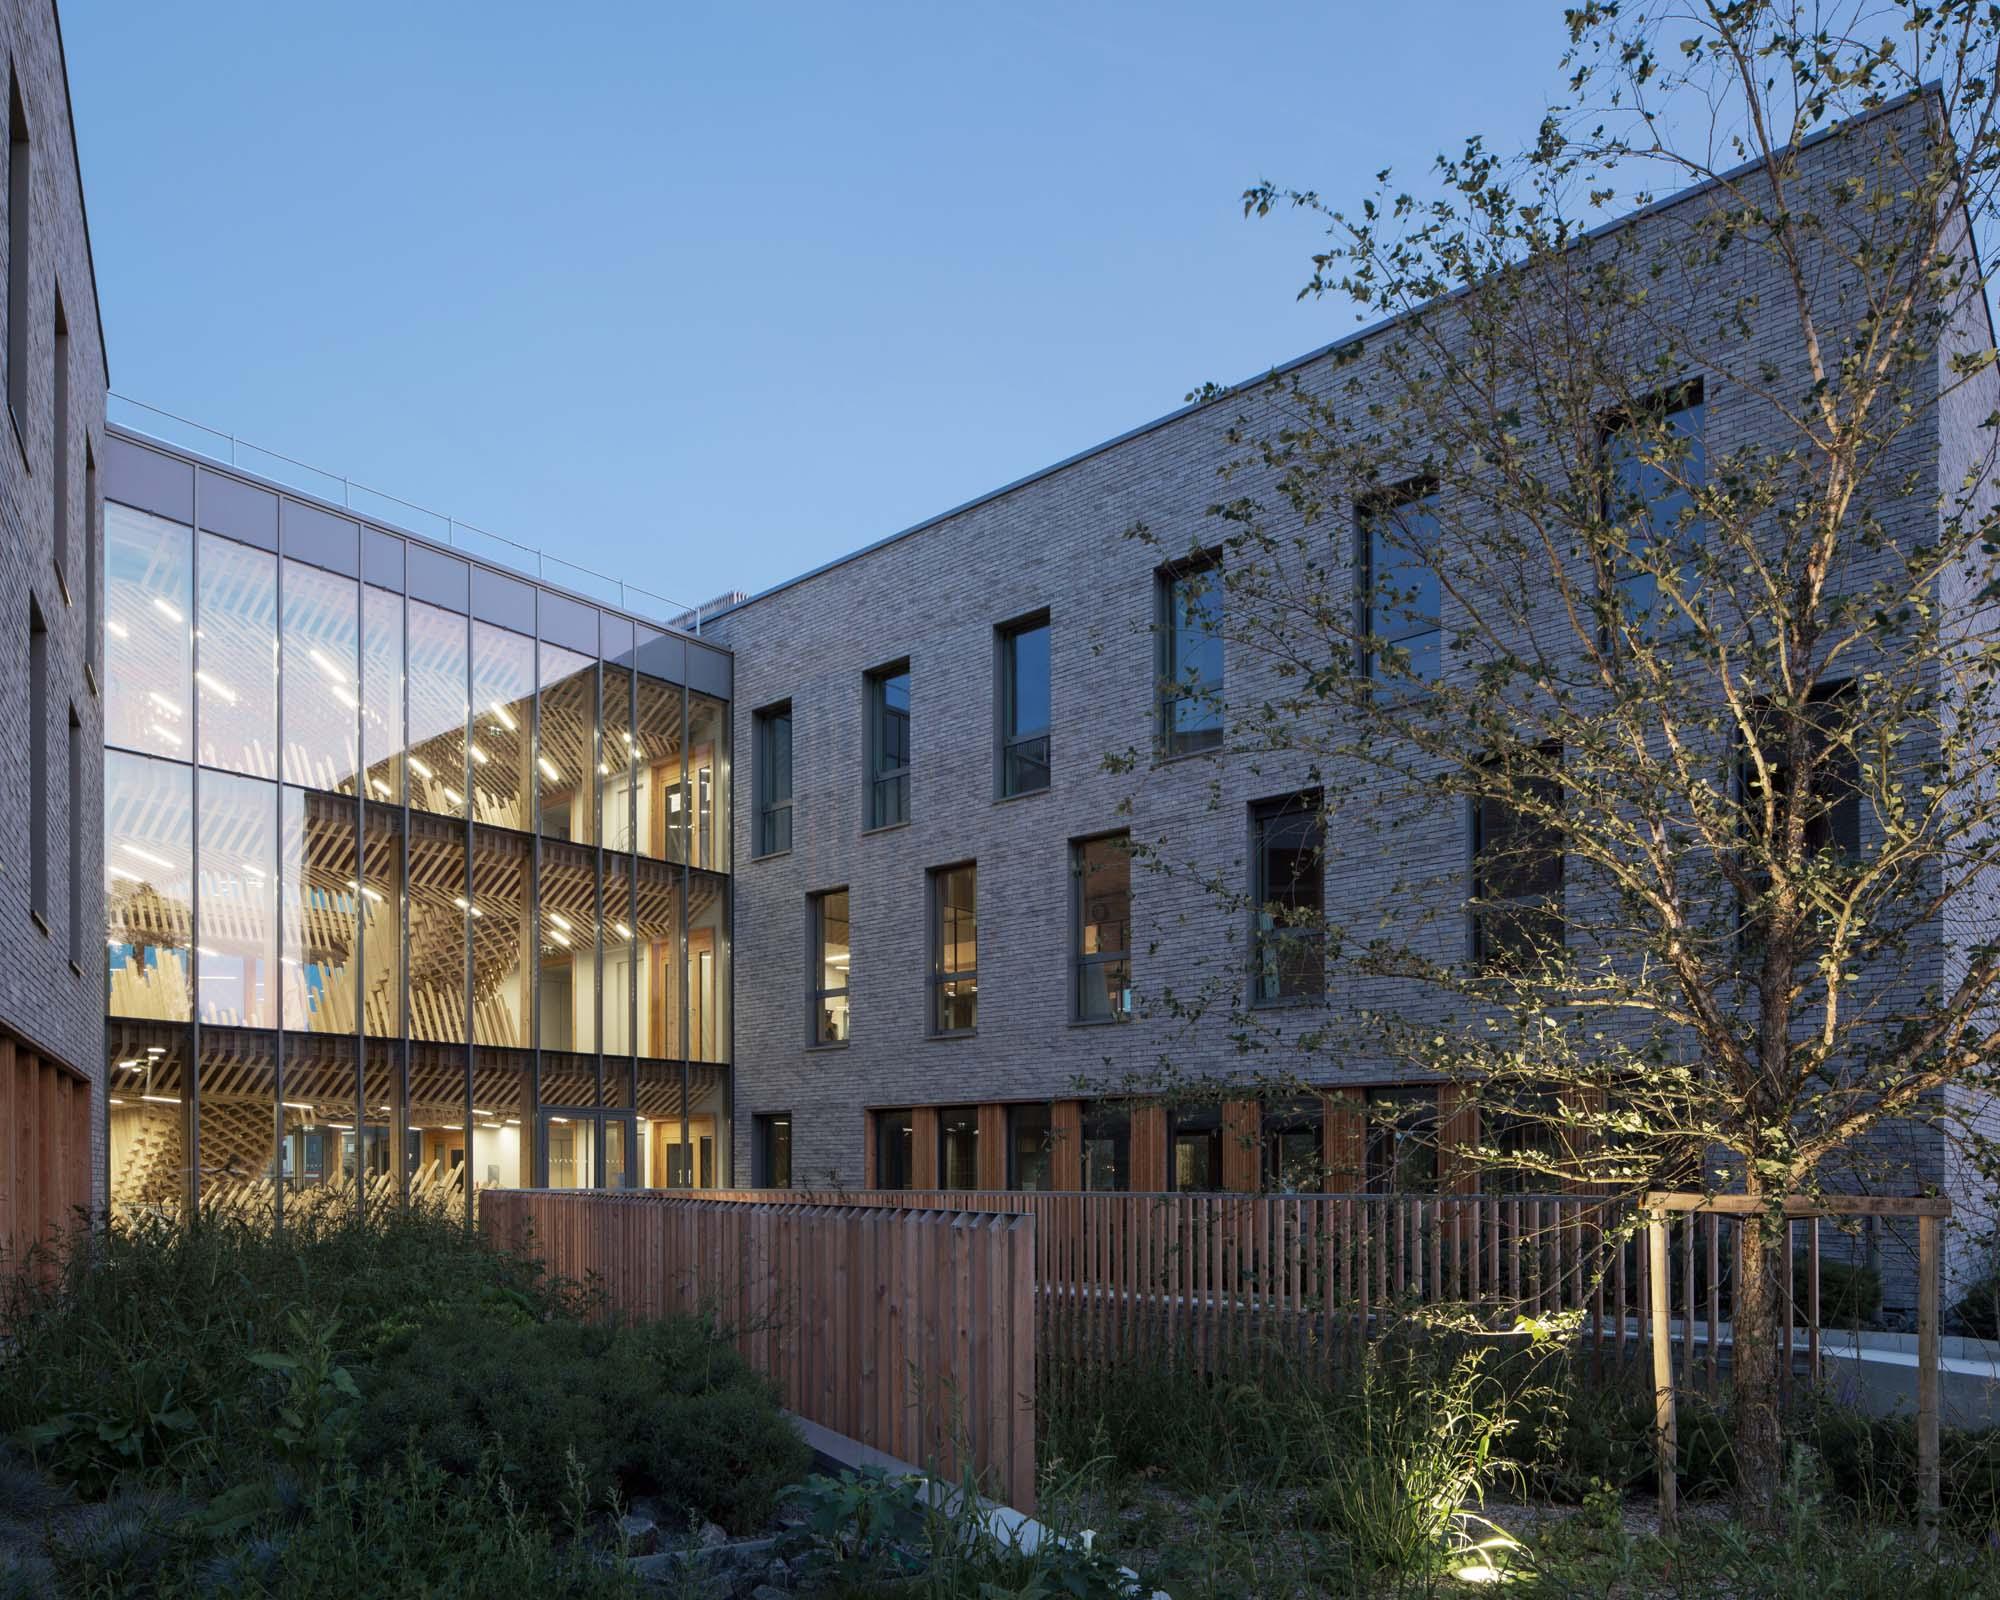 ardepa visite architecturale 2018 bureaux metronomy saint herblain forma6 tolefi promotion